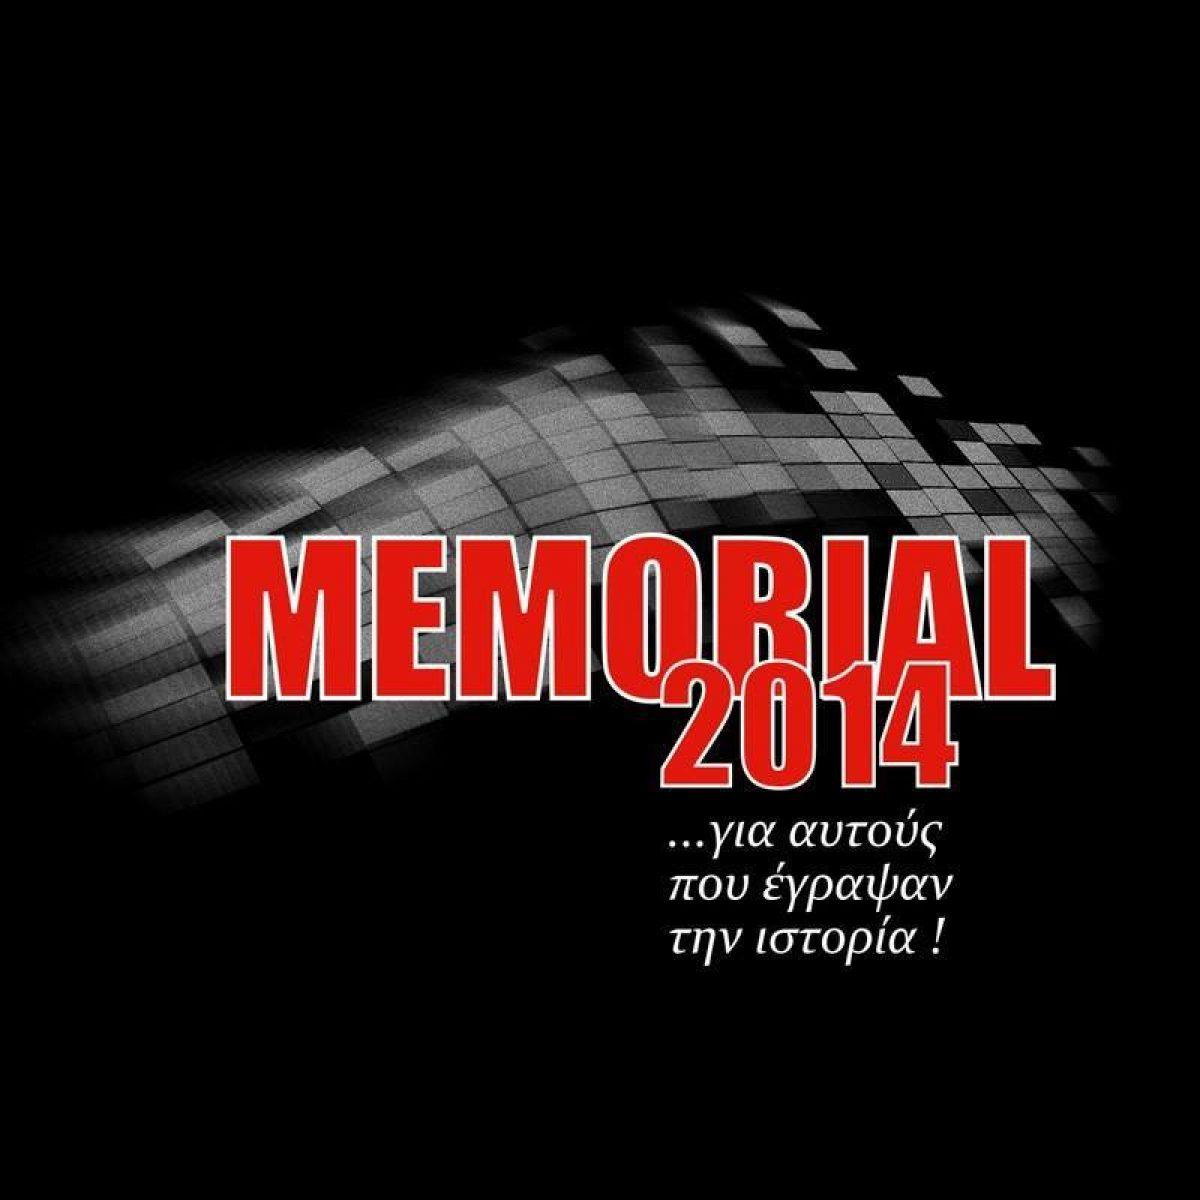 Memorial 2014 …για αυτούς που έγραψαν ιστορία!